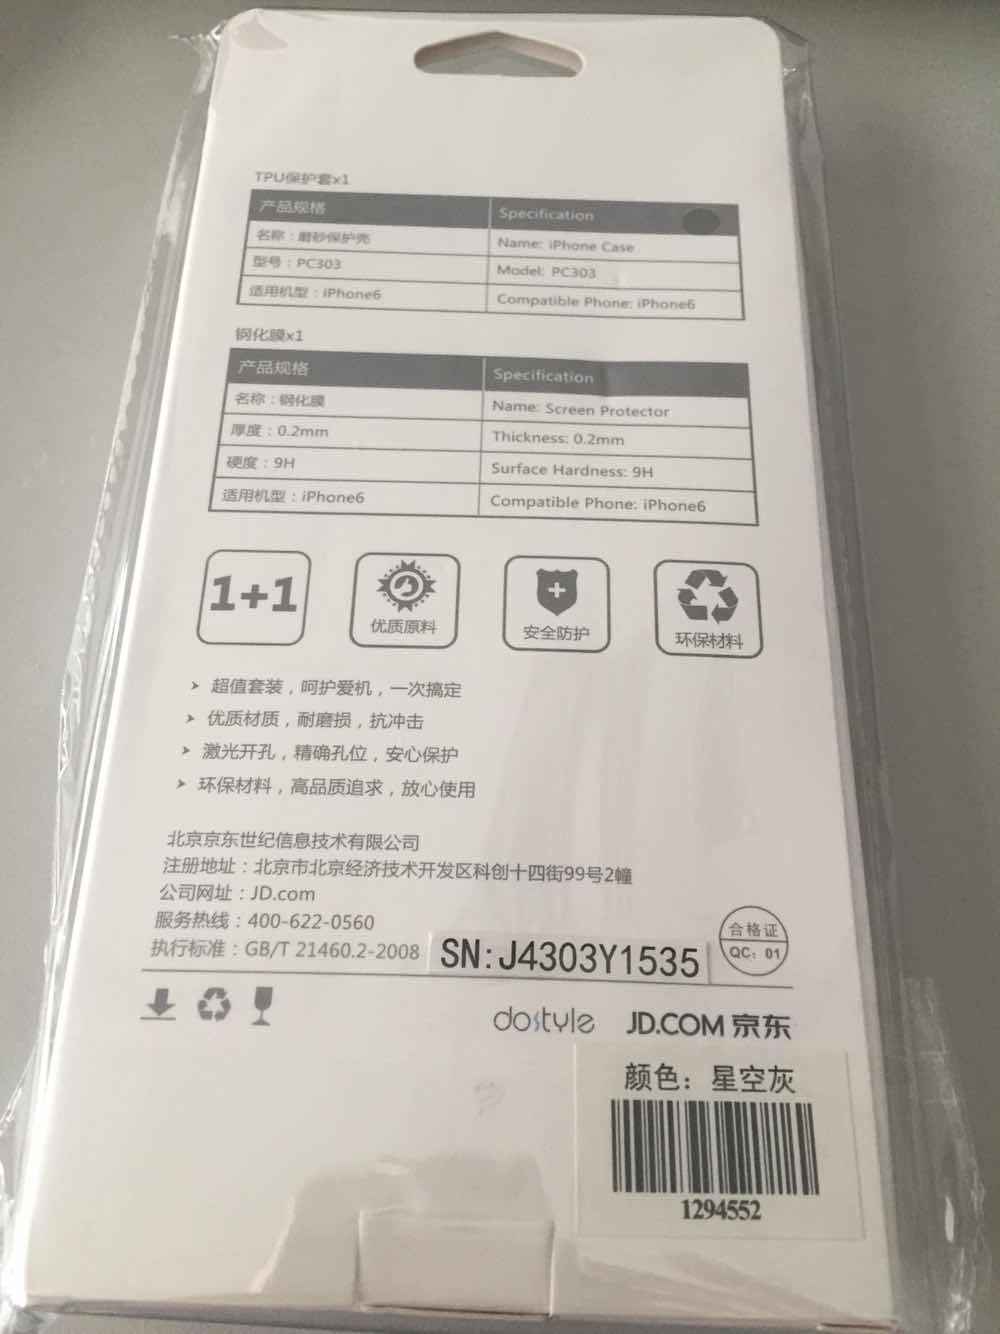 asics shihan netshoes reviews 00270064 replica